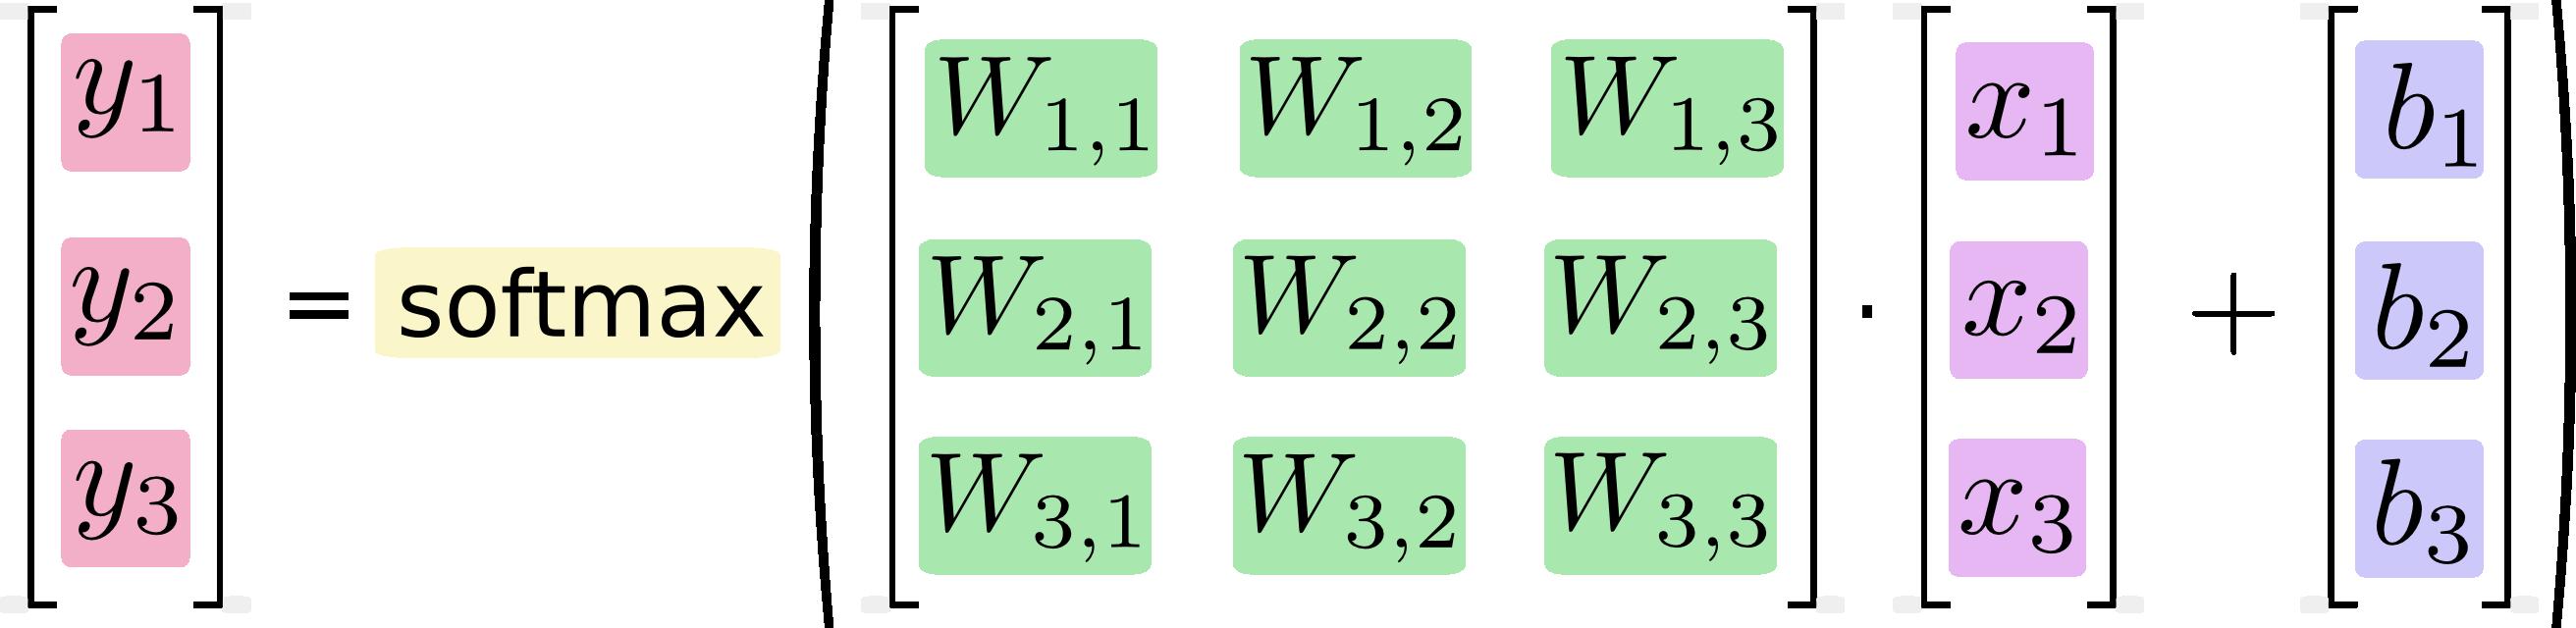 softmax-regression-vectorequation